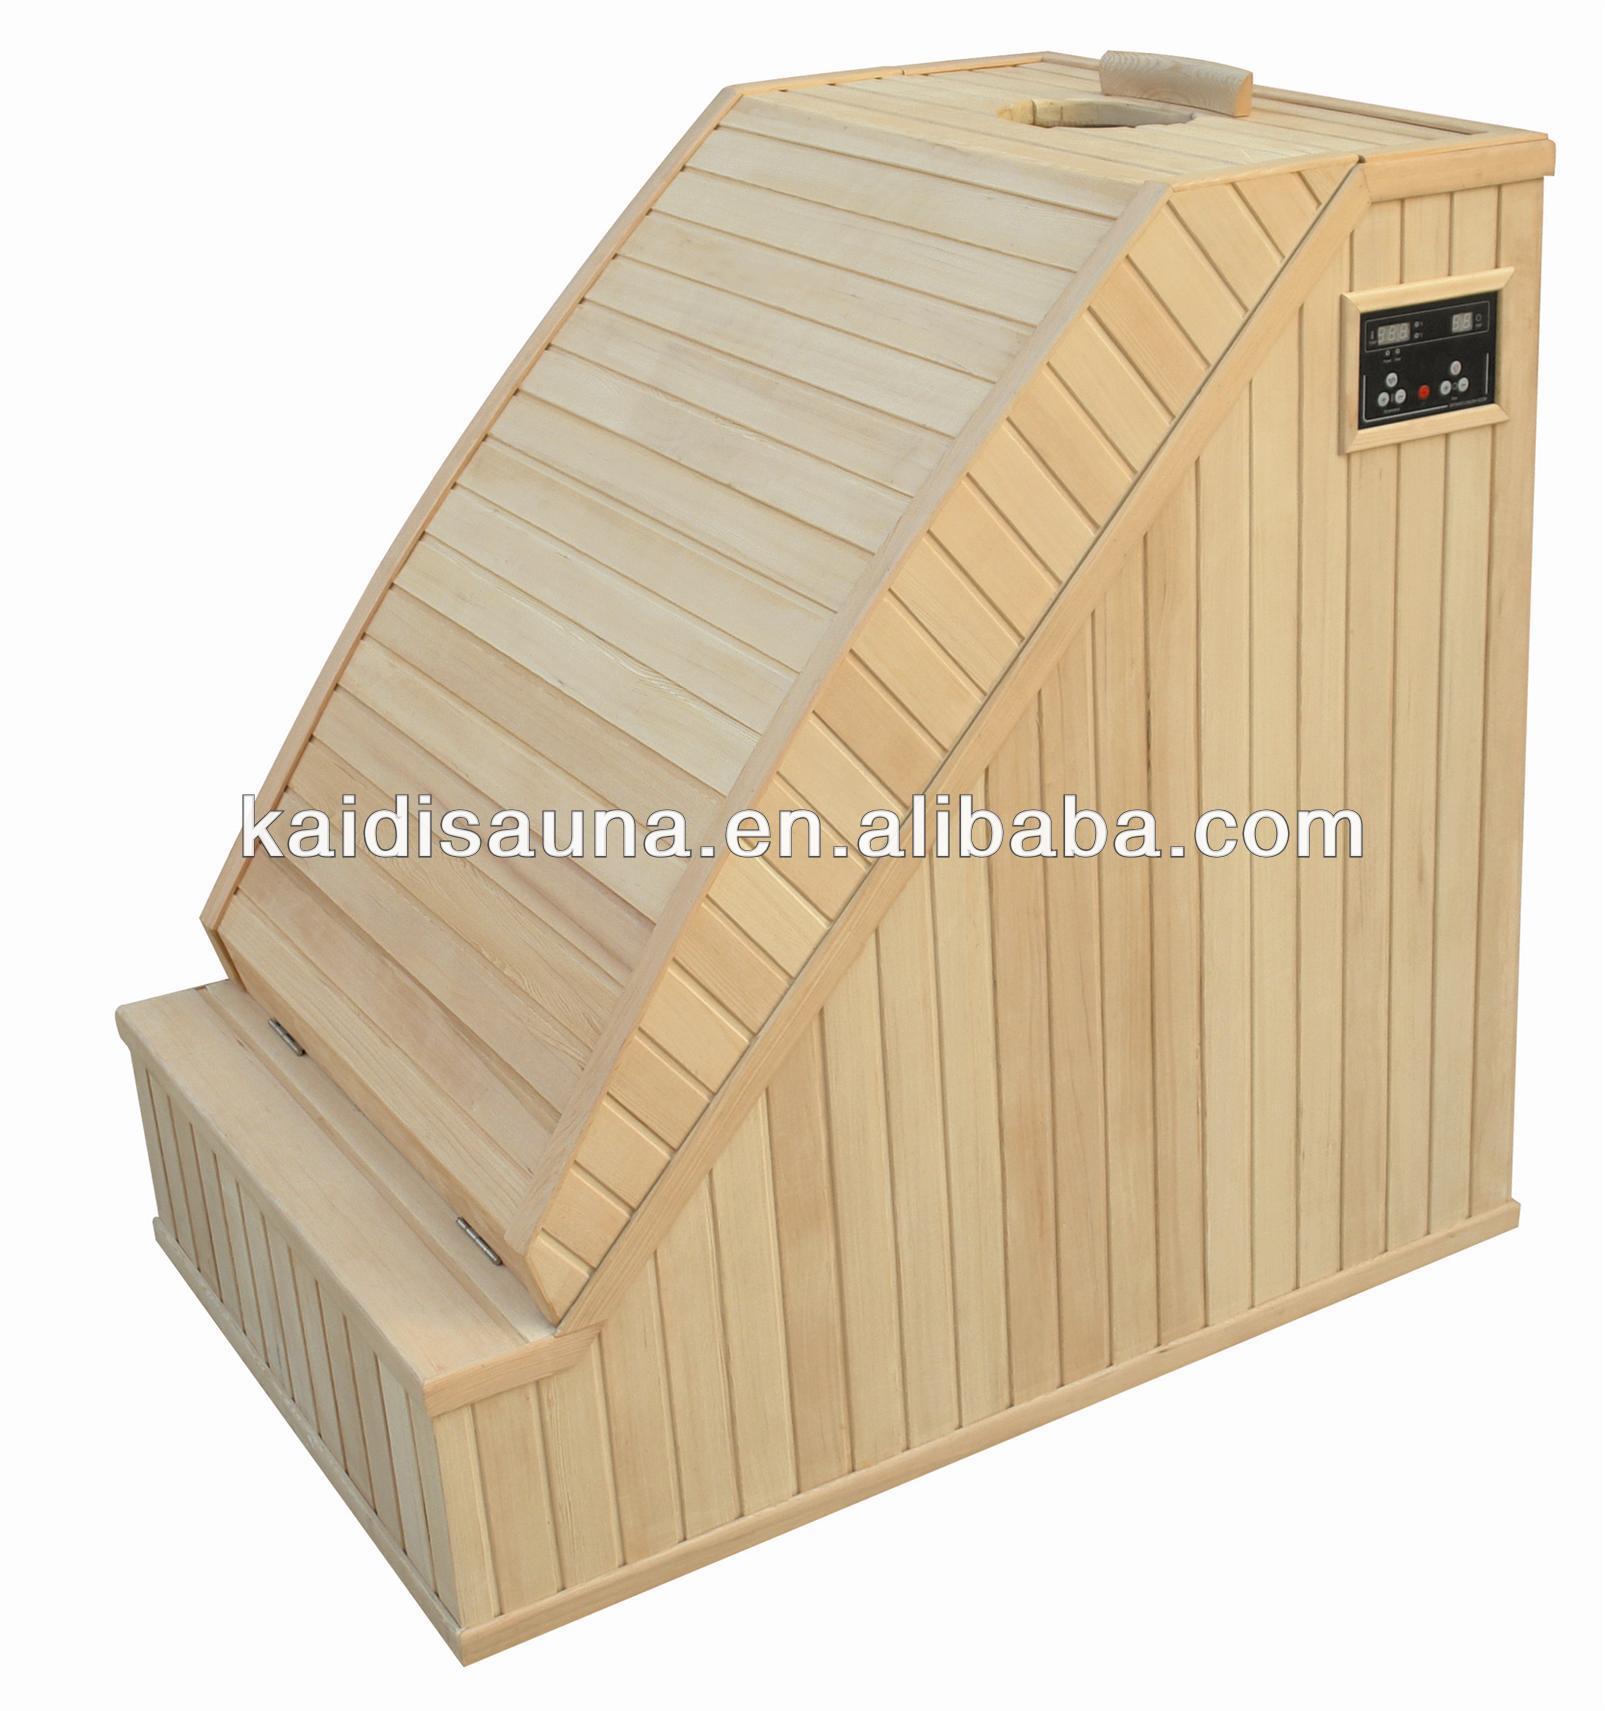 mini sauna canada hemlock half body sauna kd mini01 buy. Black Bedroom Furniture Sets. Home Design Ideas